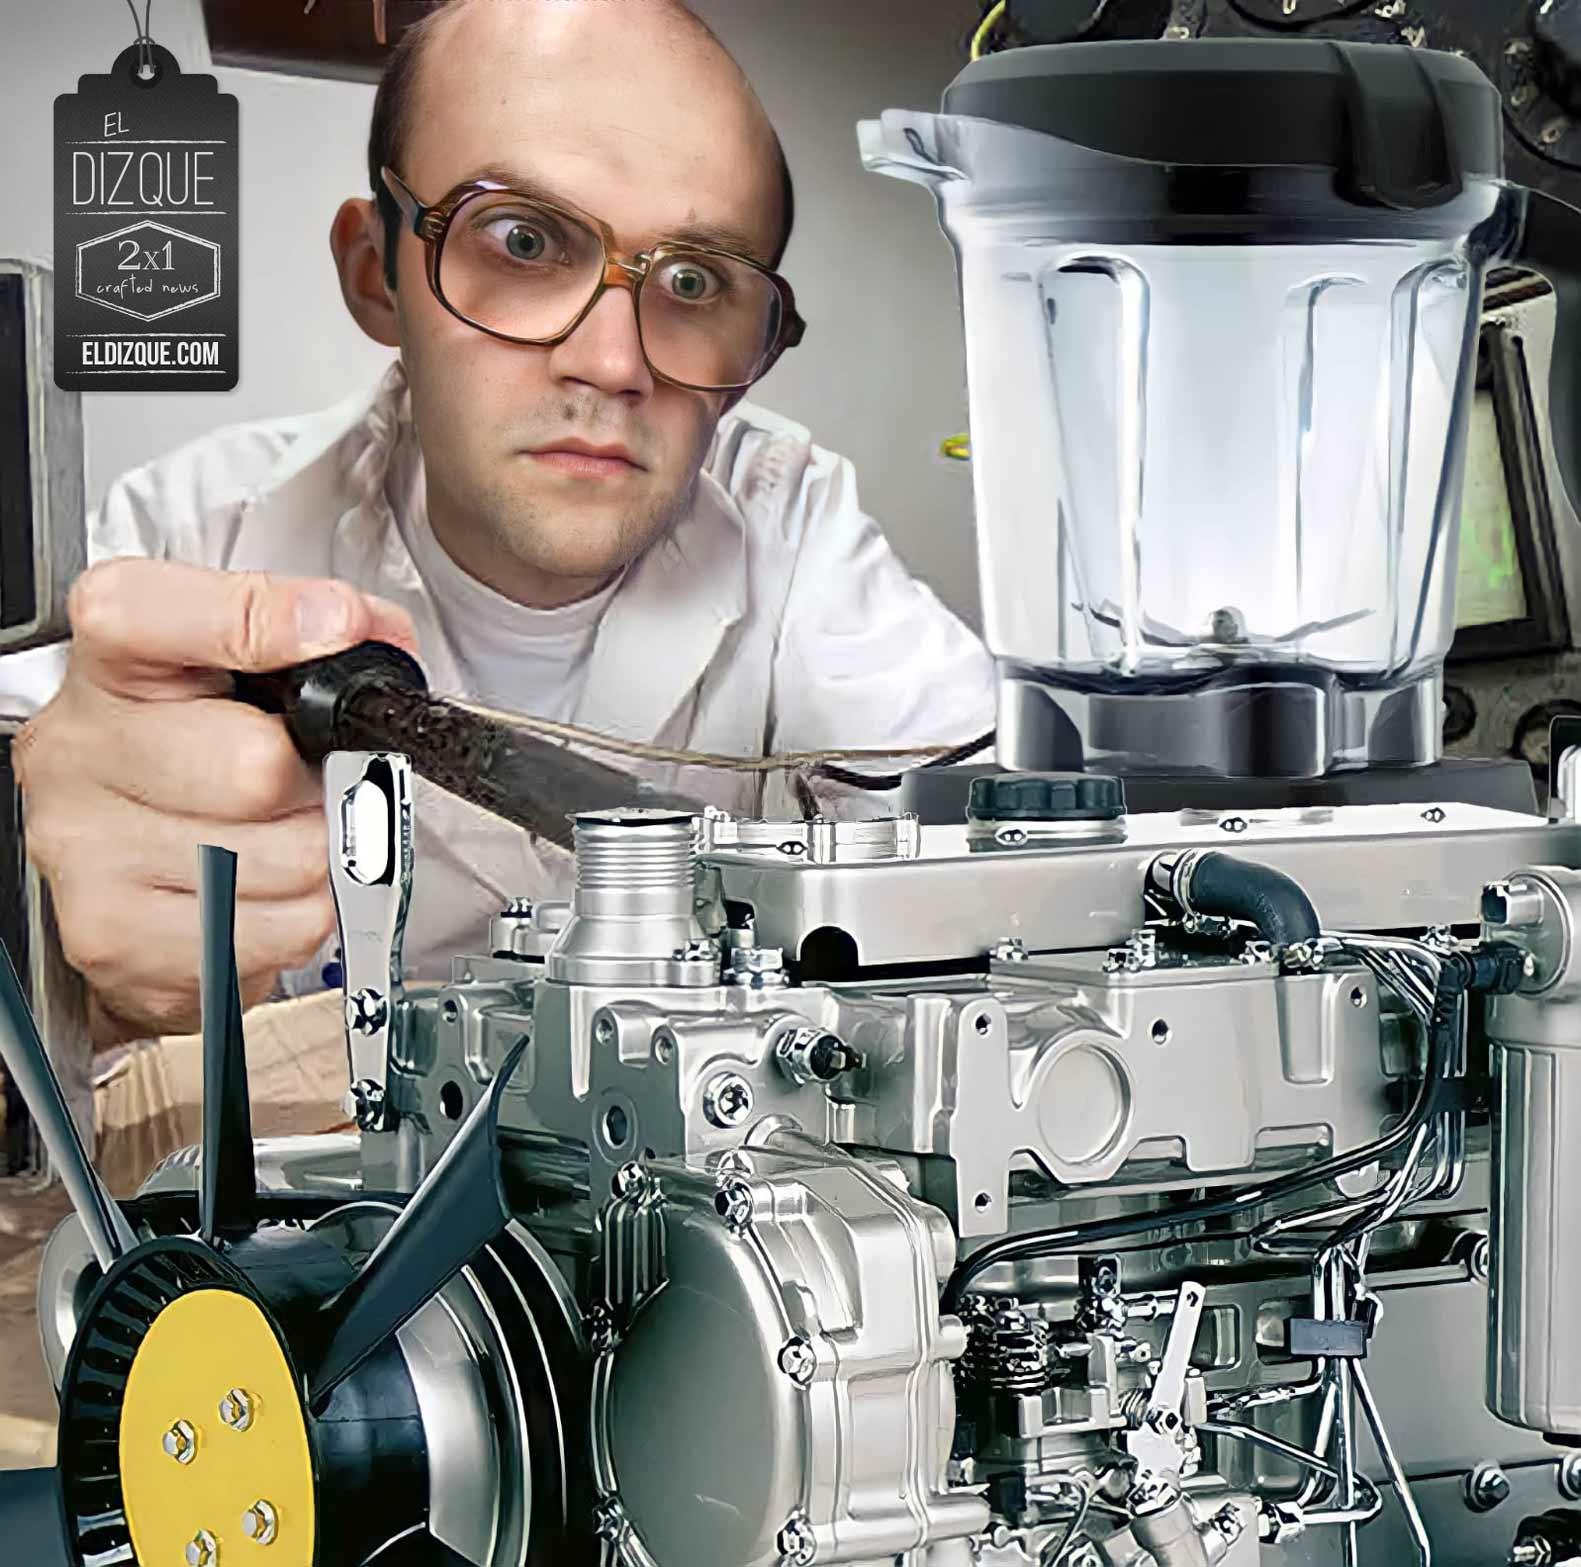 Licuadora a base de diesel